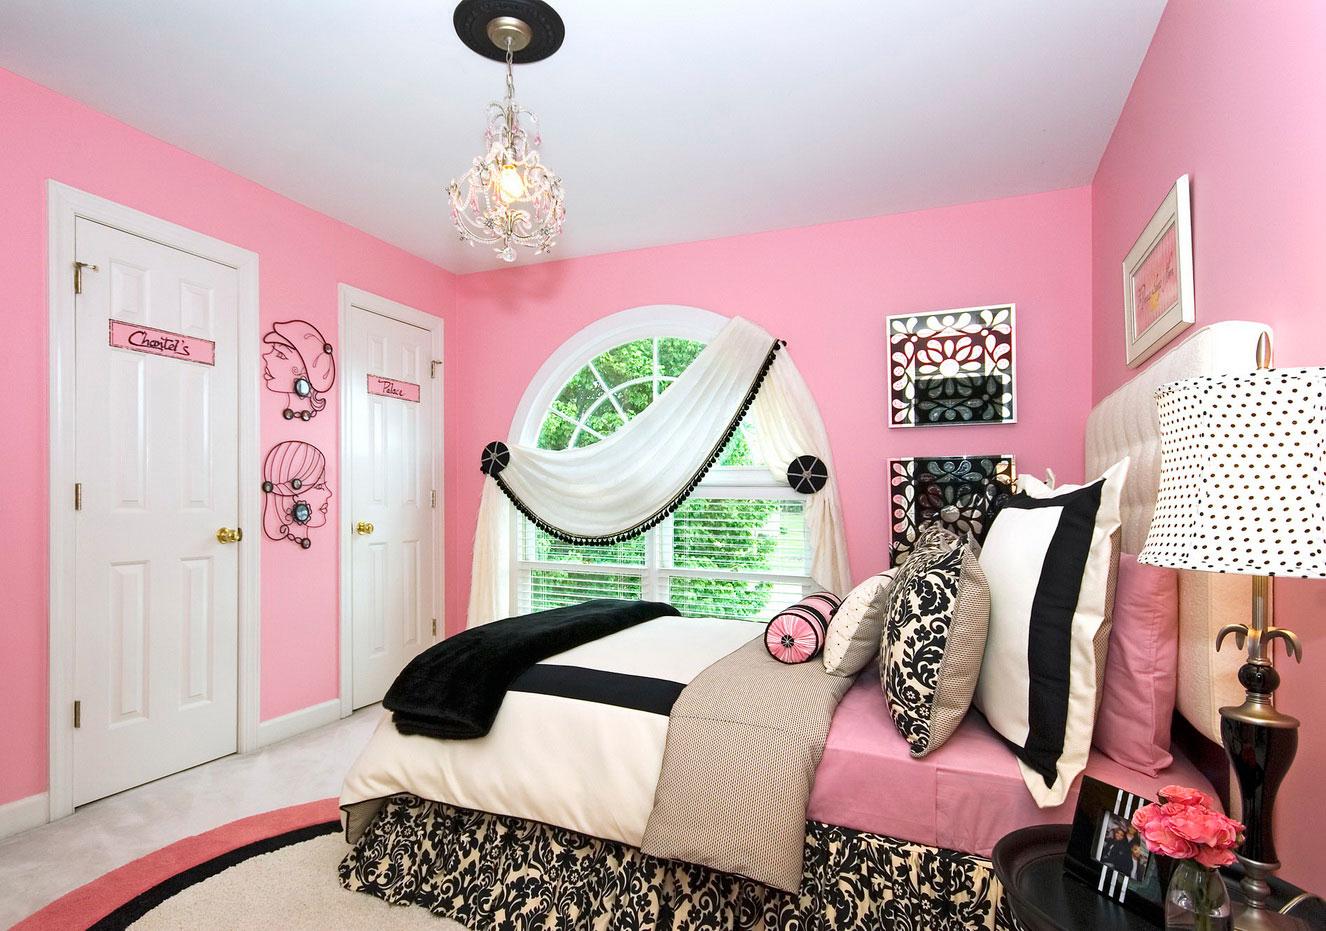 Free Download Cute Bedroom Ideas For Teenage Girl 1326x931 Your Desktop Mobile Tablet Explore 46 Wallpaper Teen Rooms Wallpapers